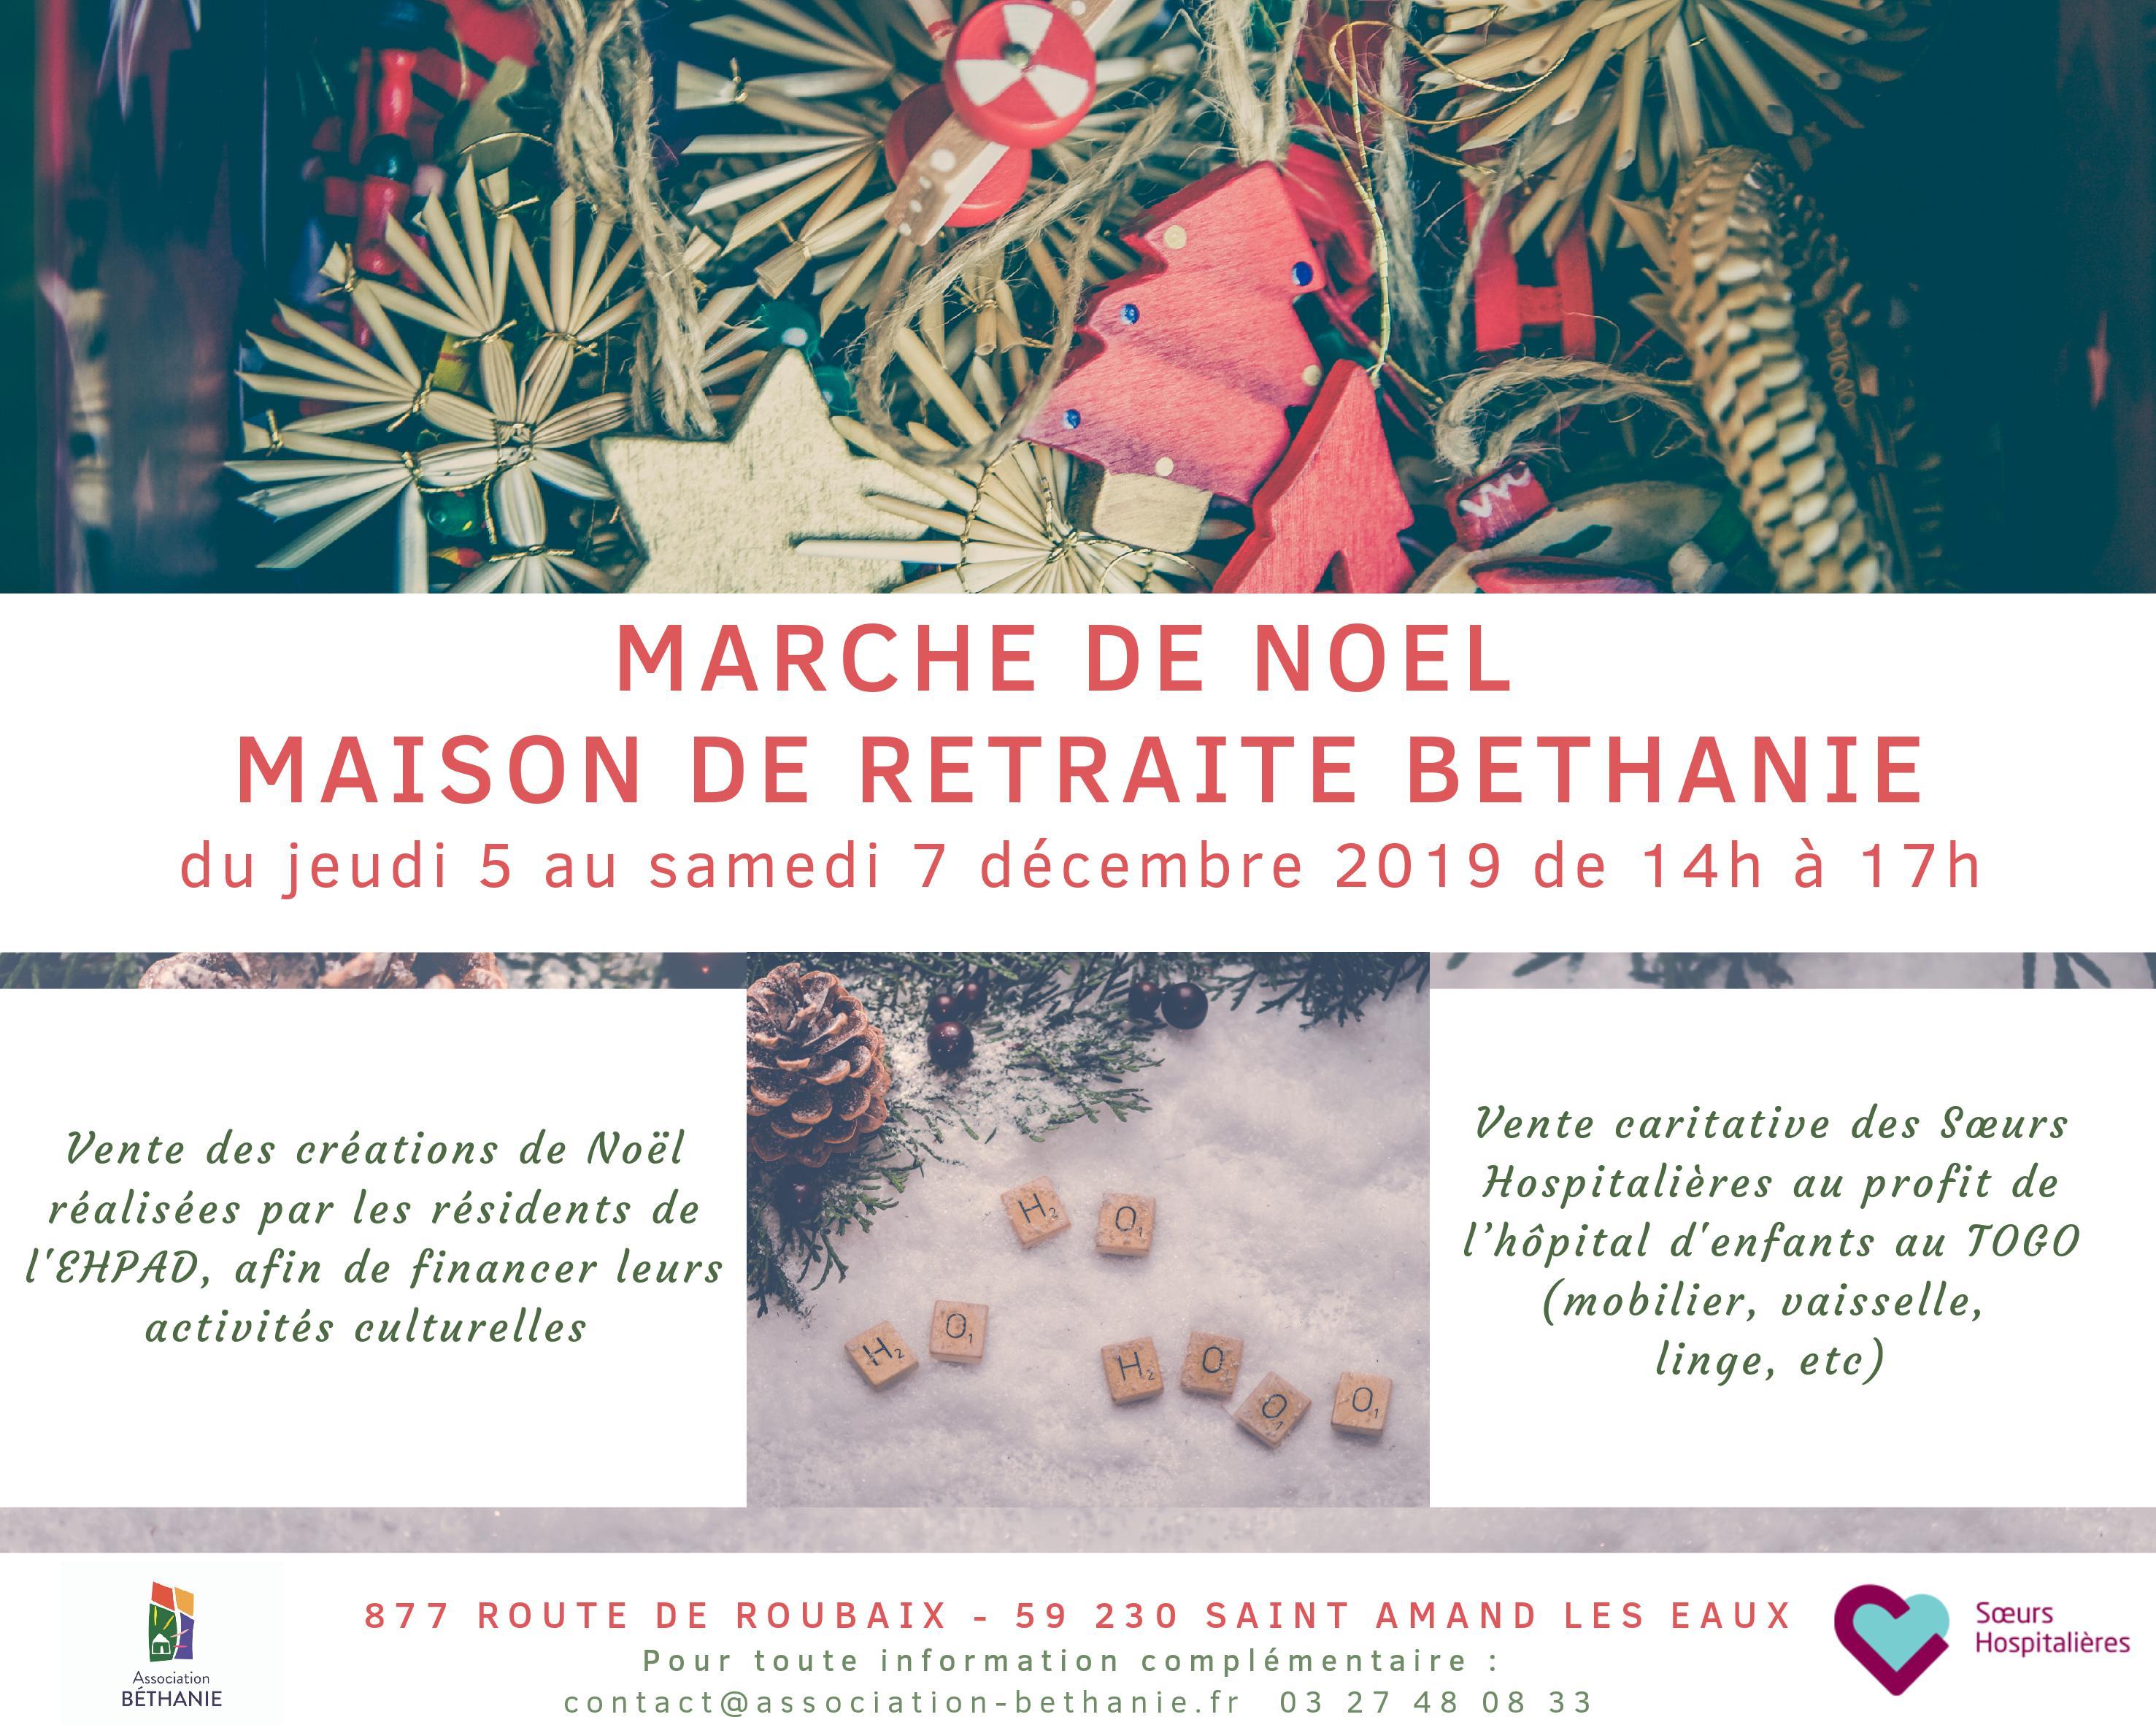 marche-de-noel-bethanie-2019